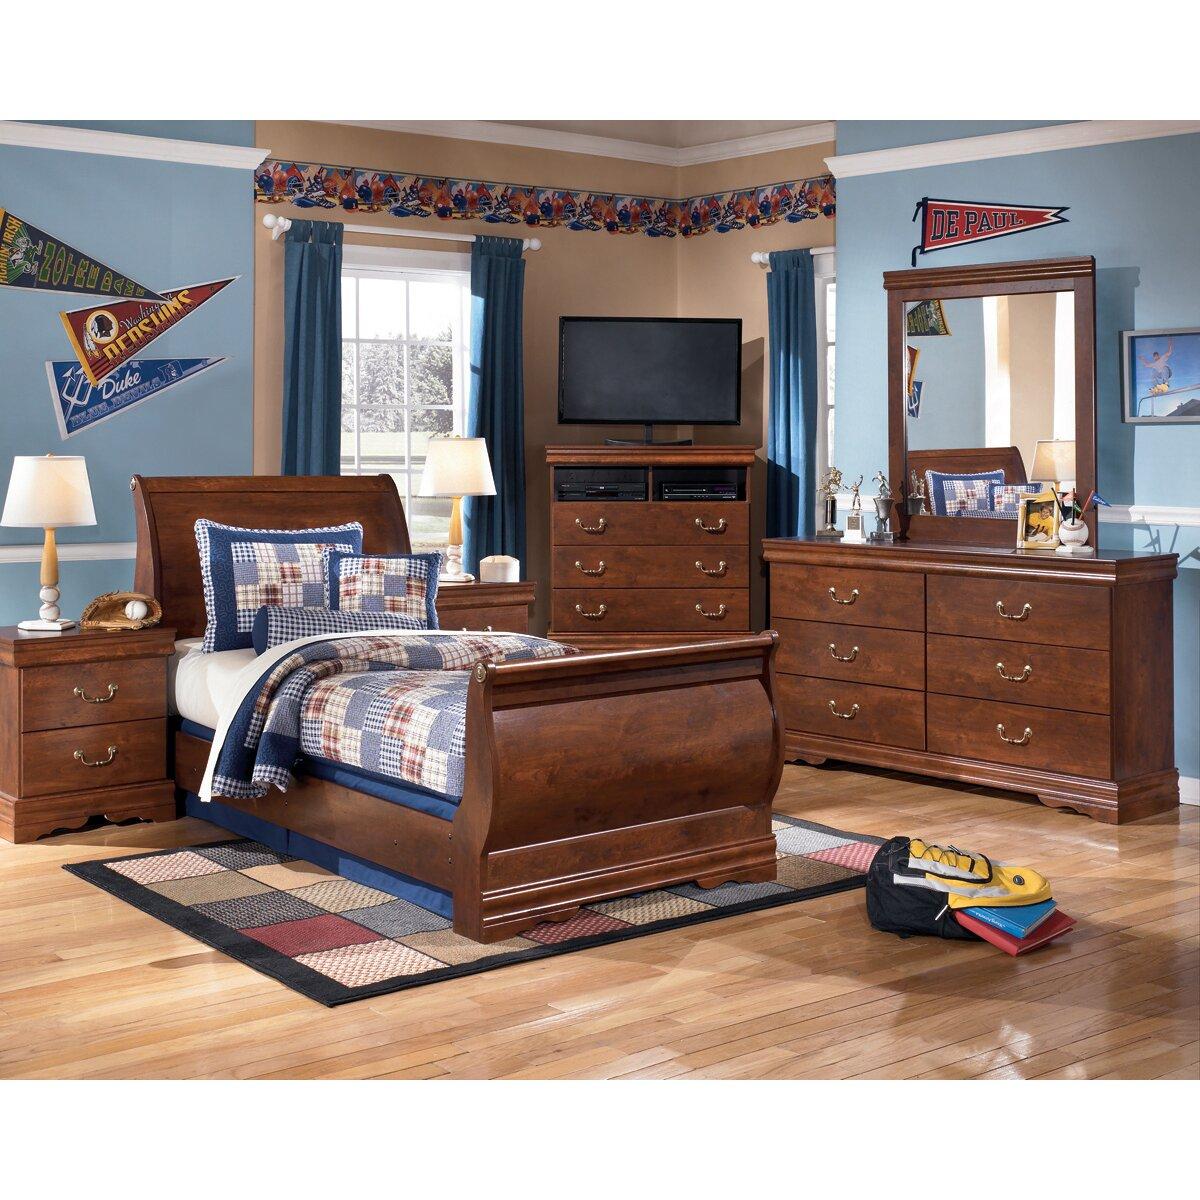 Wildon Home Wilmington Sleigh Headboard Reviews Wayfair